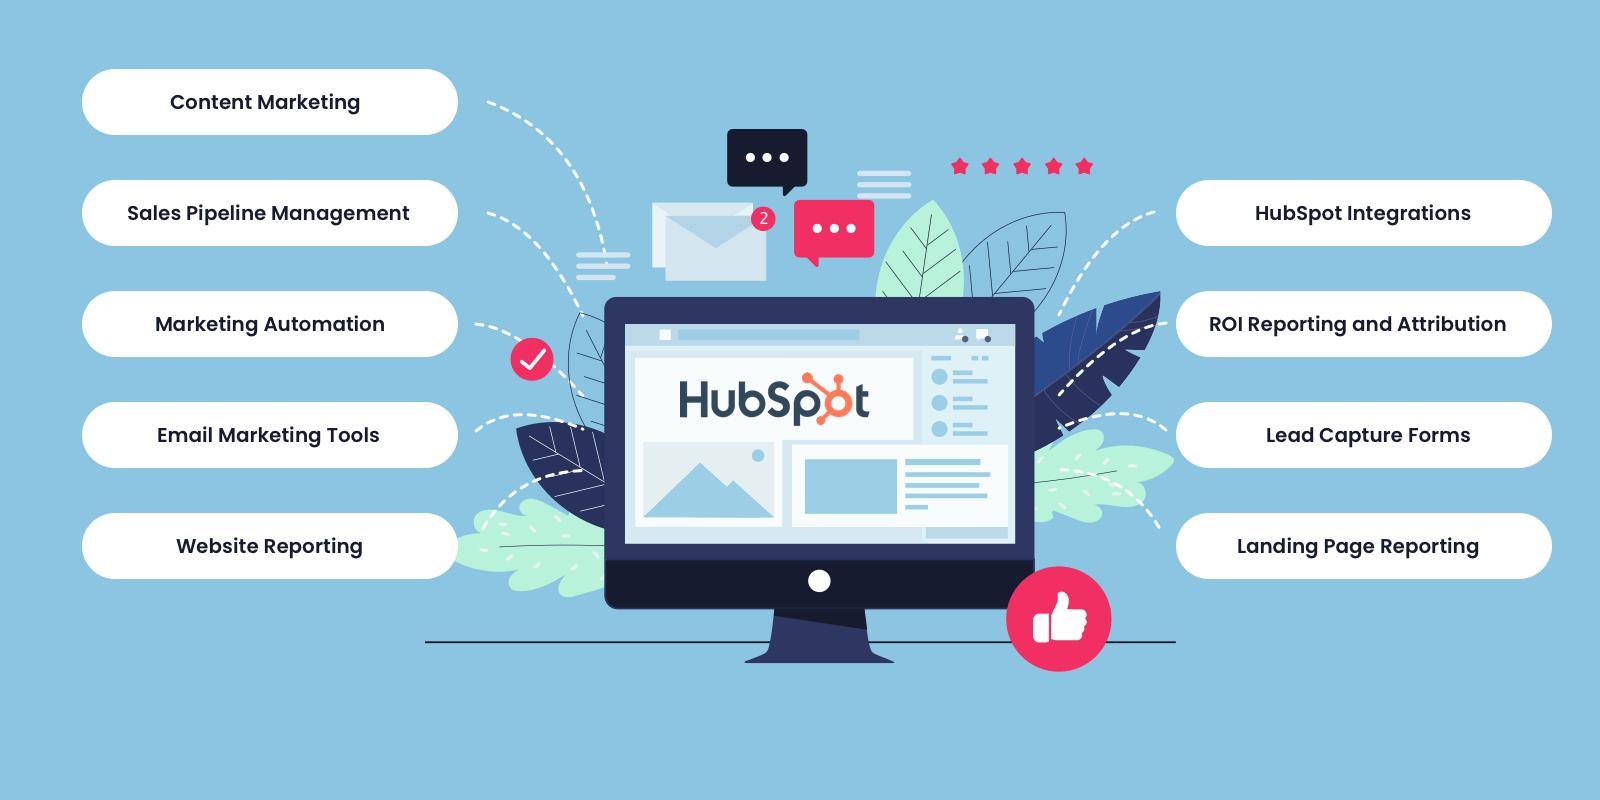 HubSpot CMS for content marketing